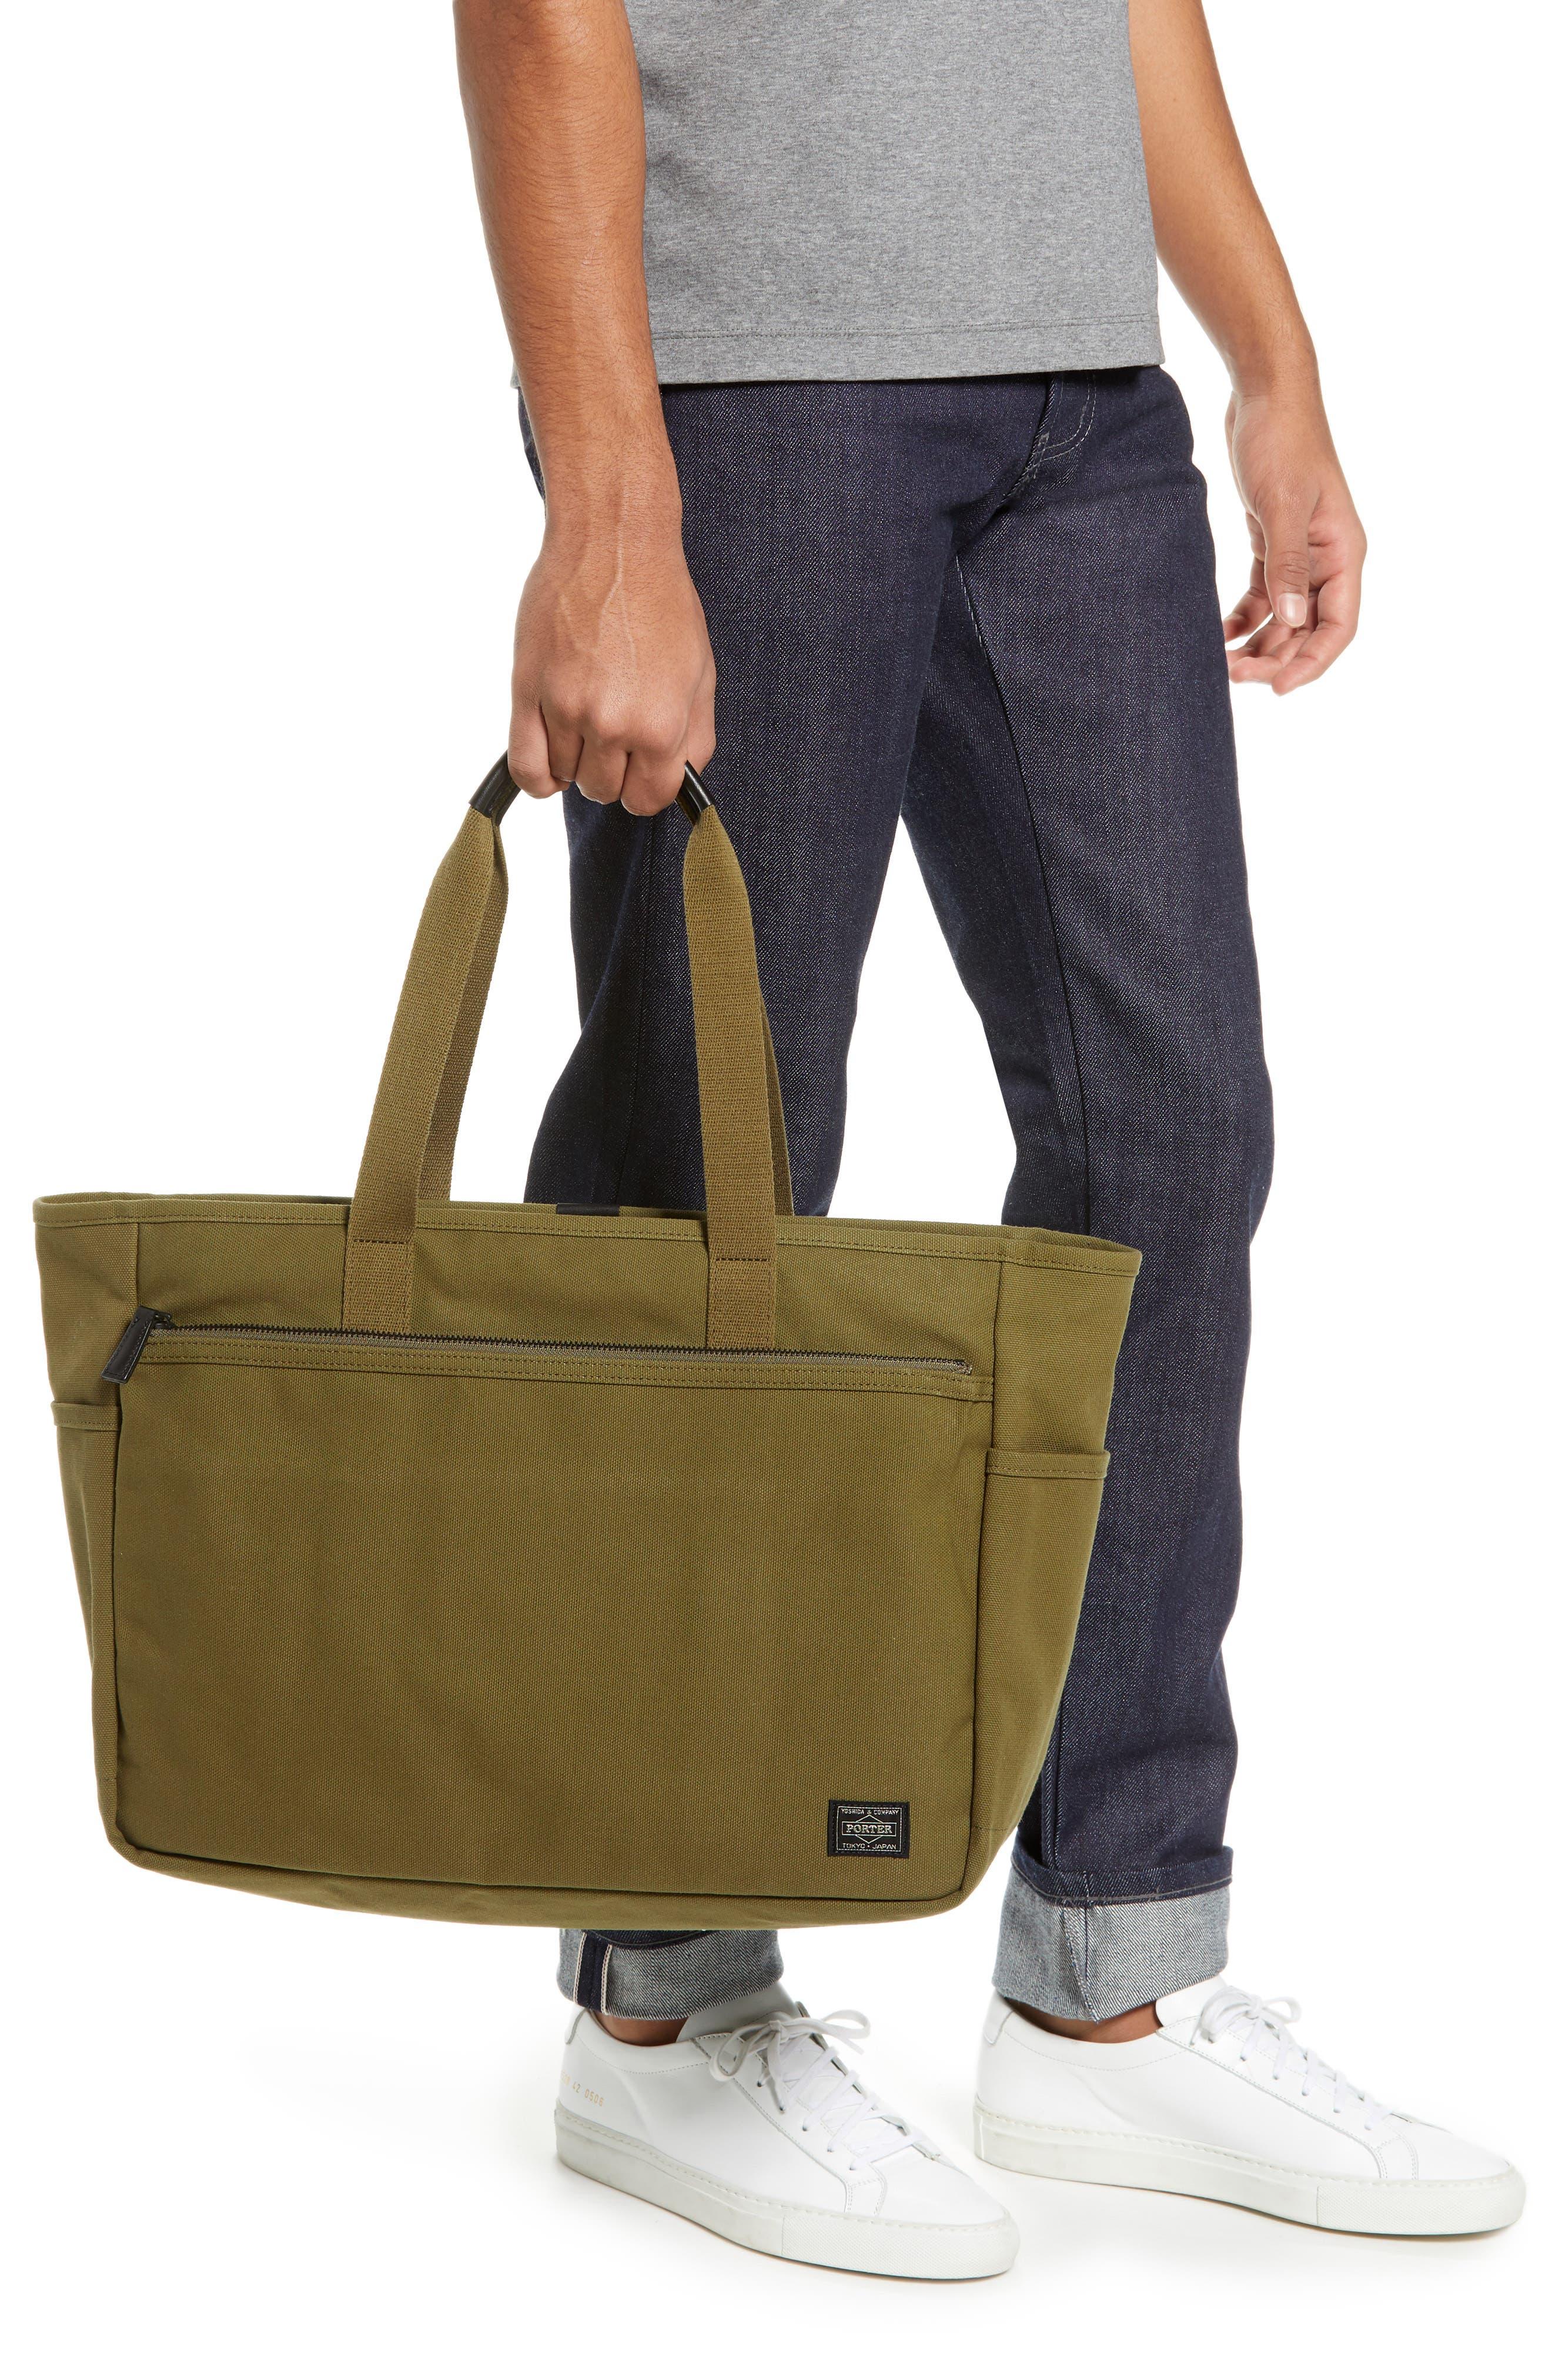 x Porter Travel Tote Bag,                             Alternate thumbnail 2, color,                             OLIVE